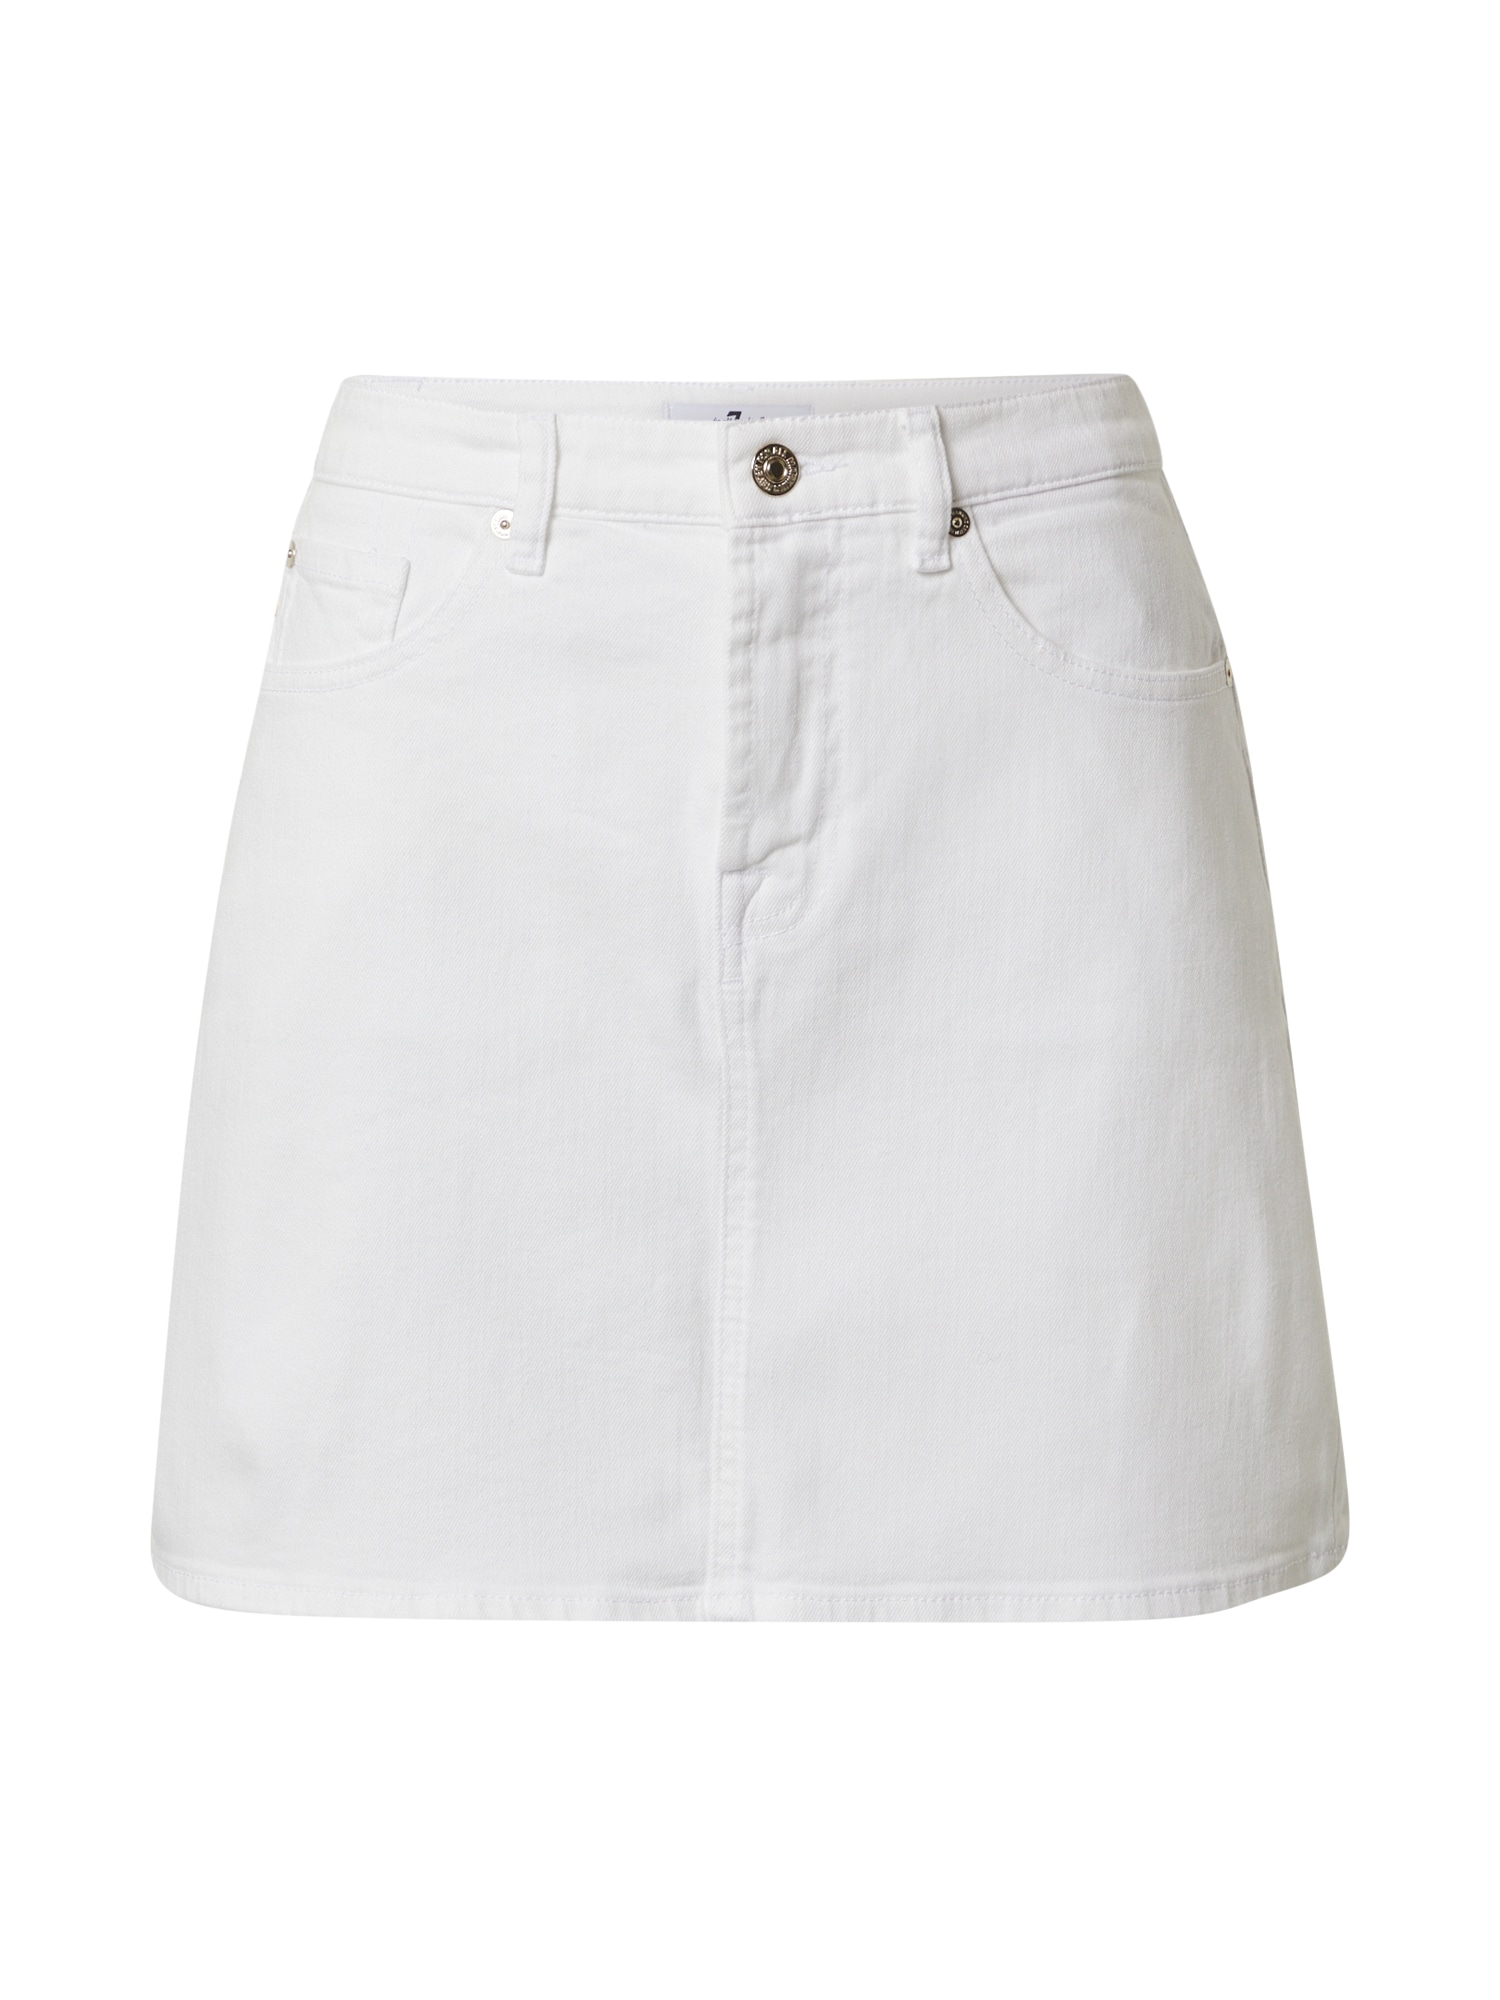 7 for all mankind Sijonas balto džinso spalva